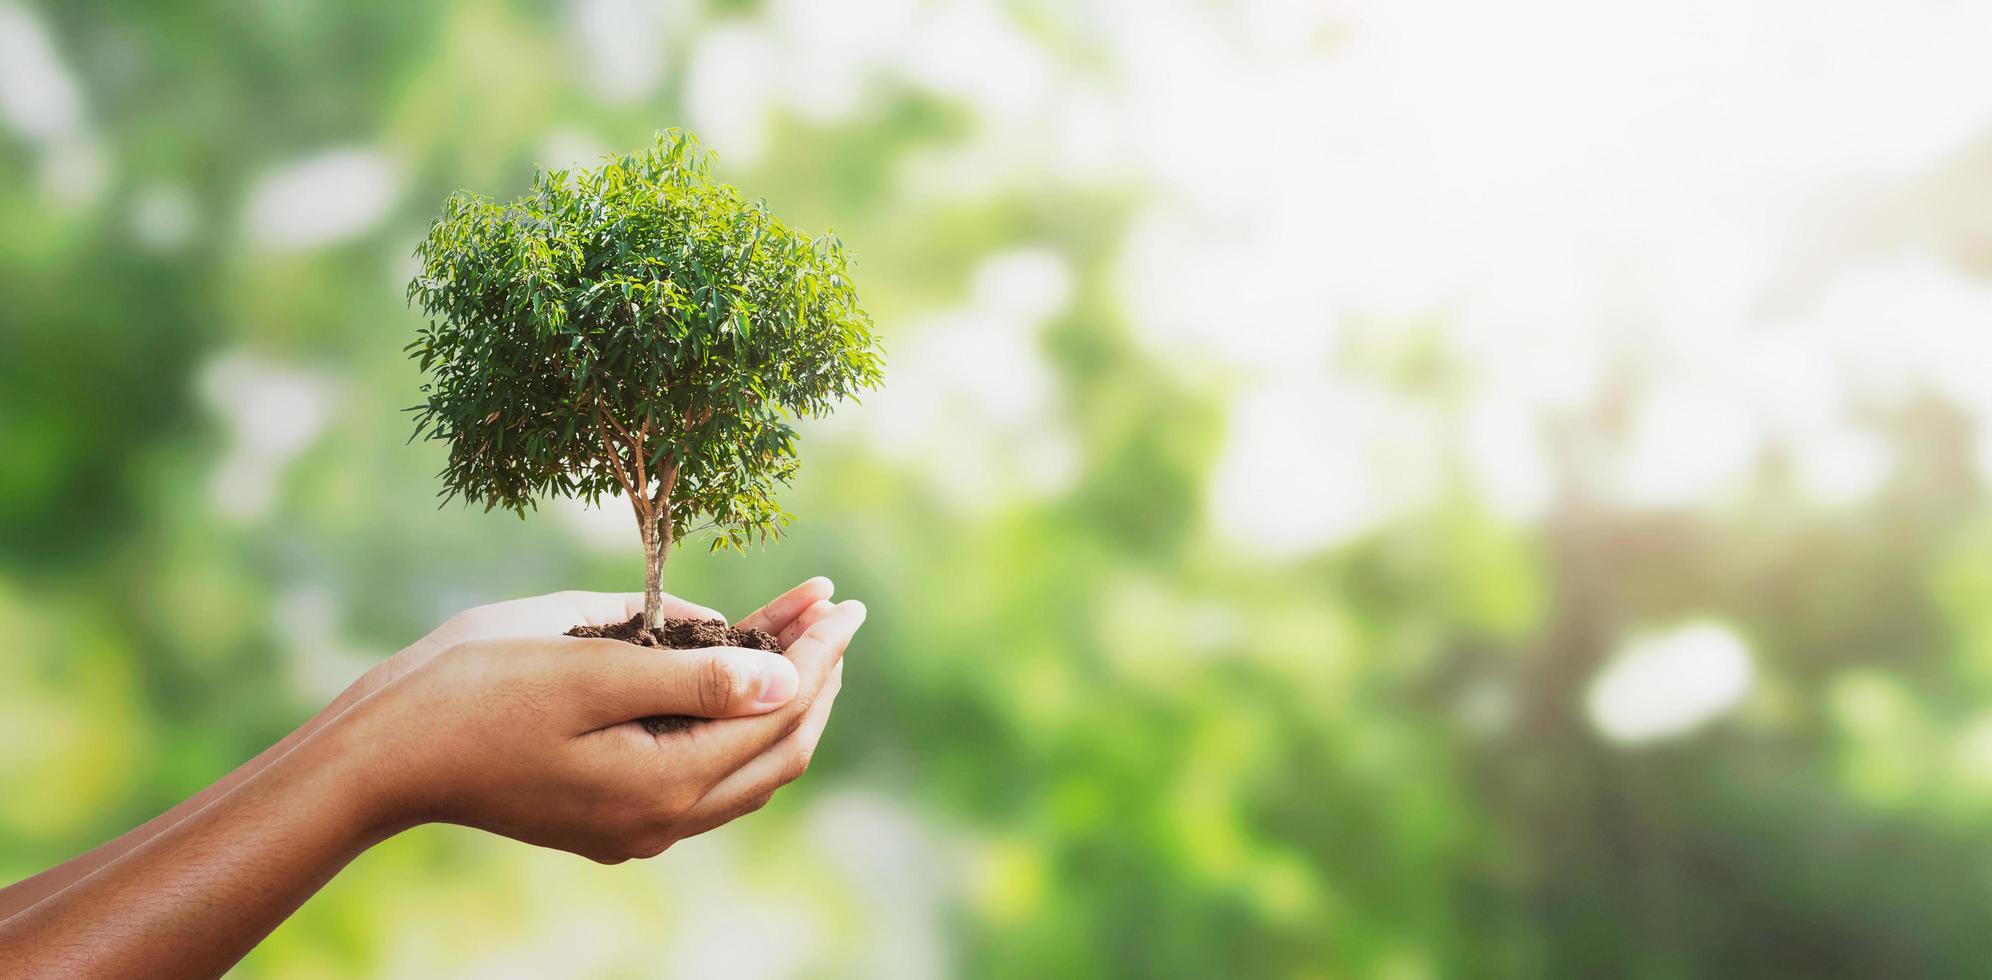 Hand holding a small tree  photo